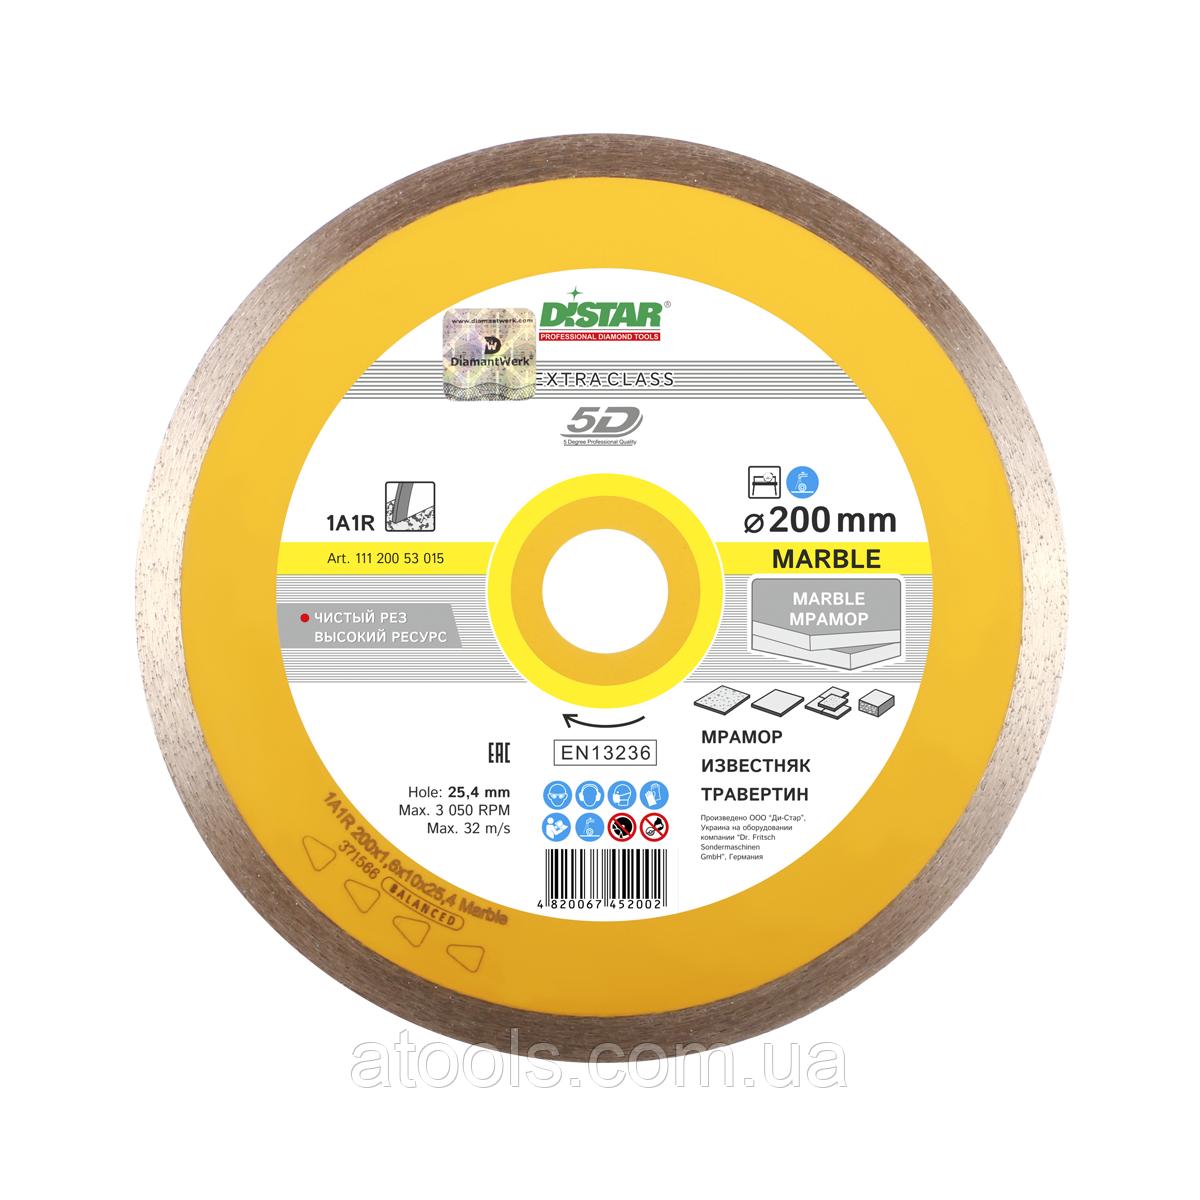 Алмазный отрезной диск Distar Marble 1A1R 230x1.6x10x25.4 (11120053017)